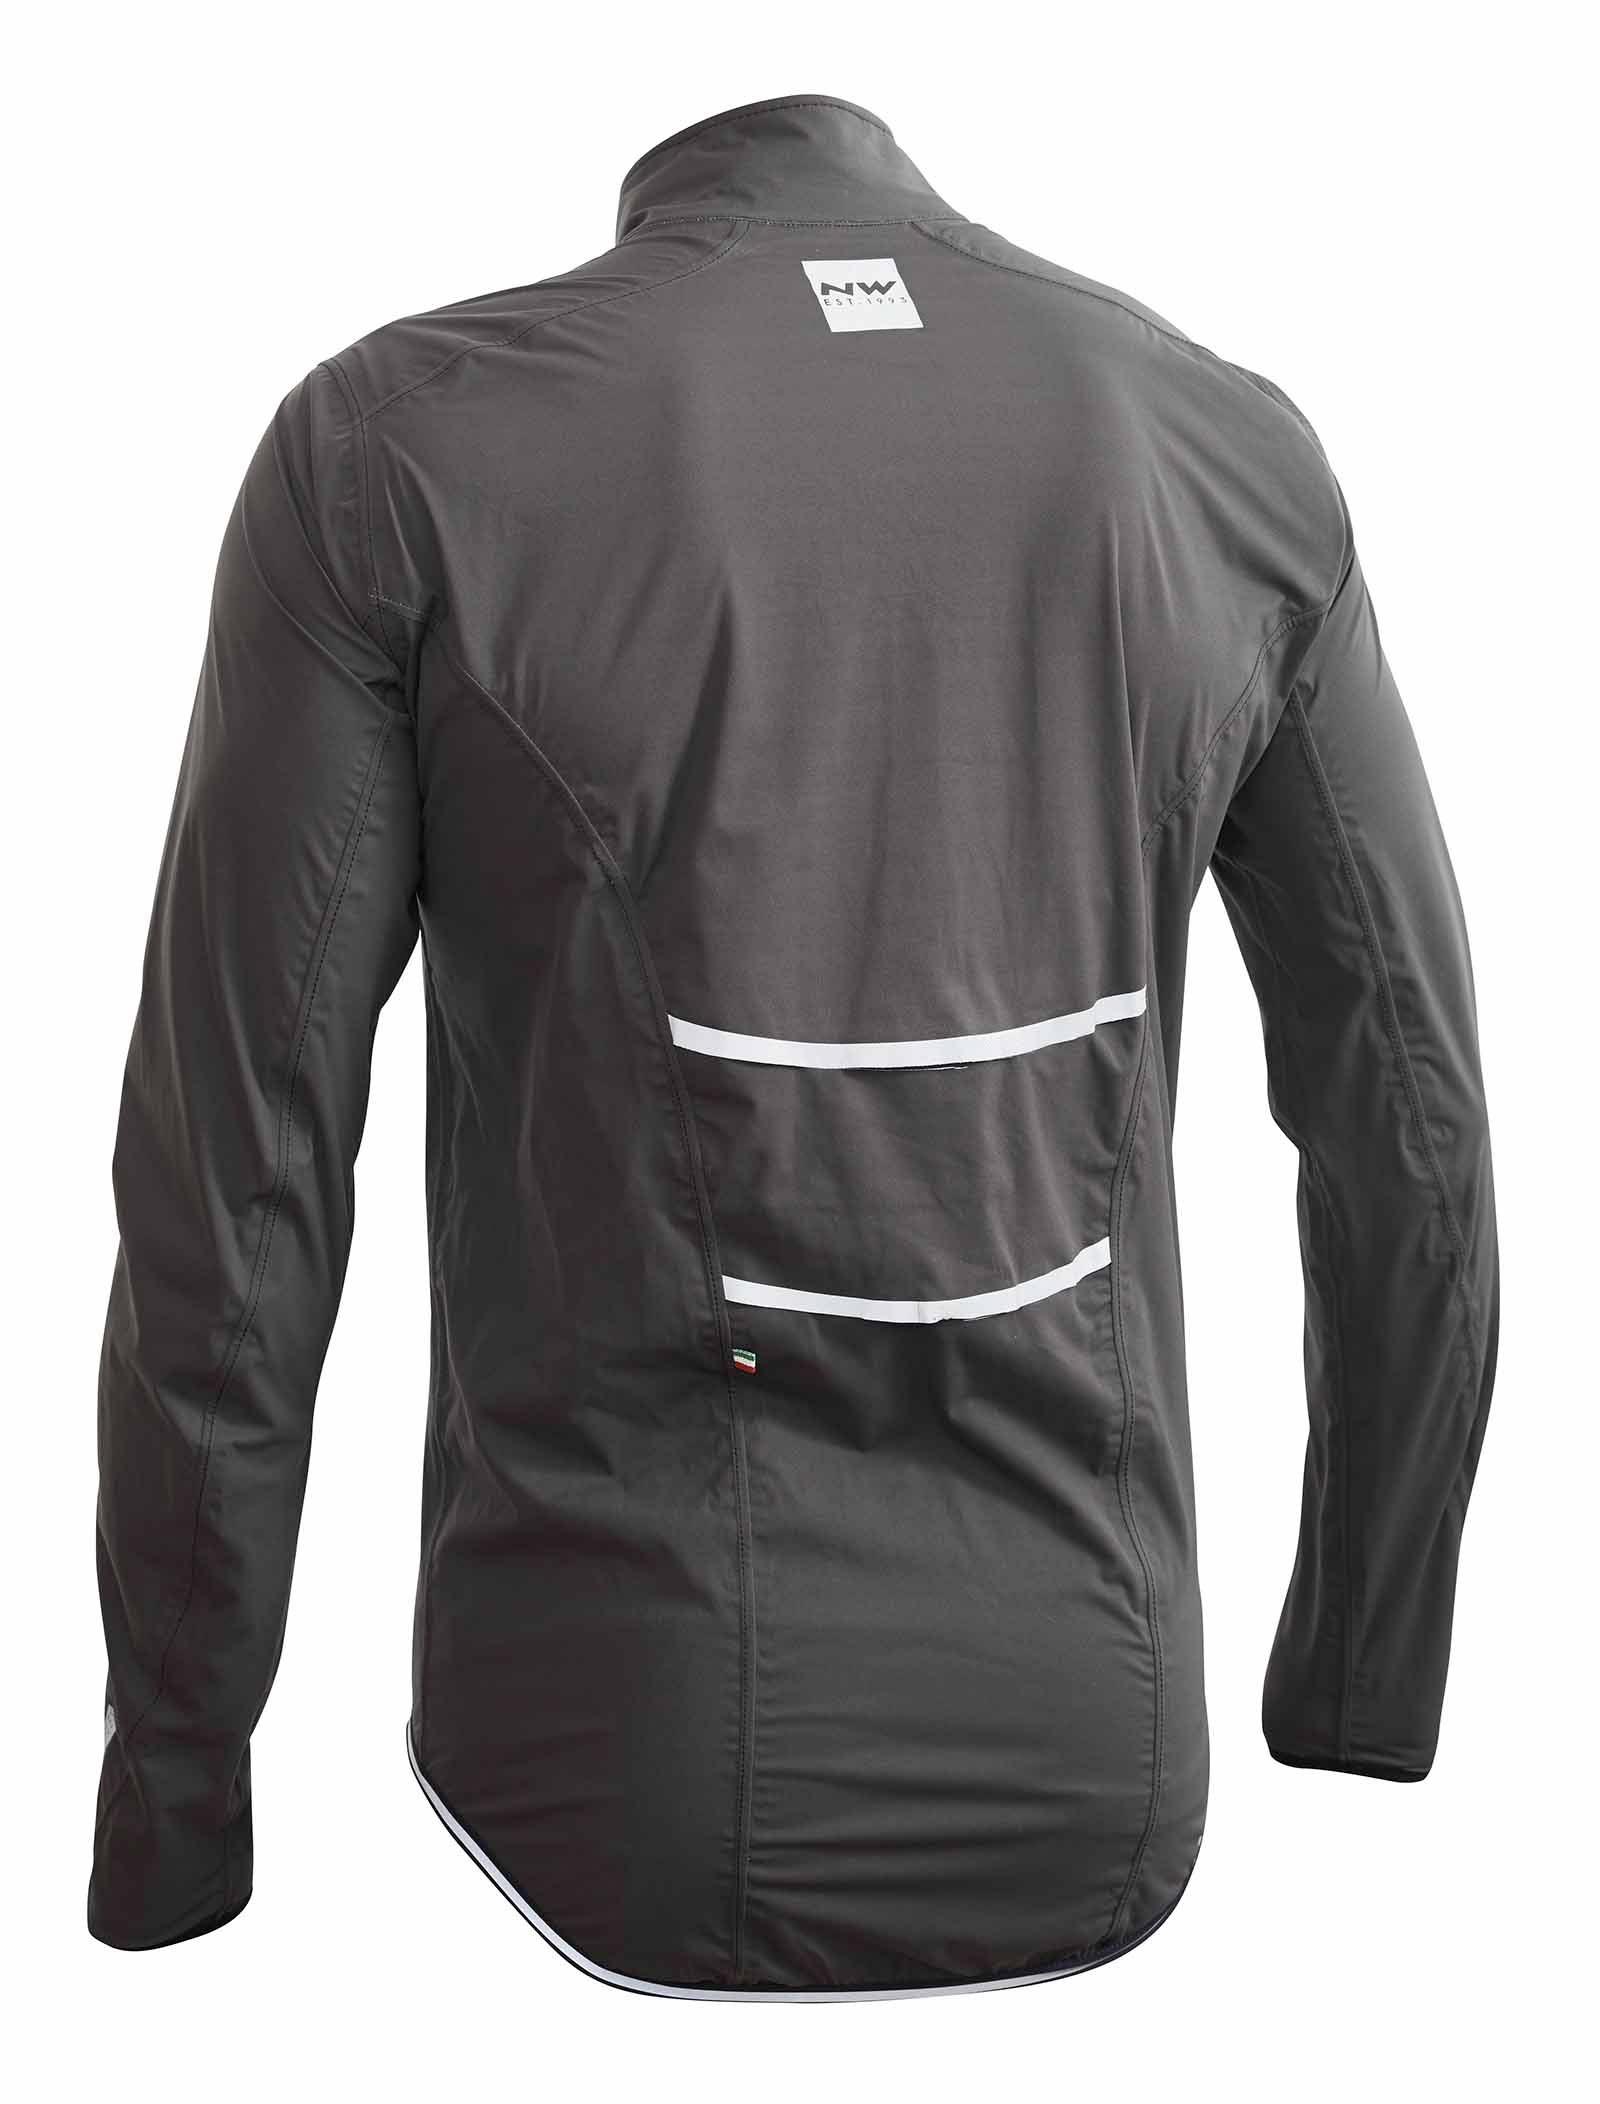 Buy Man Cycling Jacket Rainskin Anthracite 17619172 | Italy2Us.com